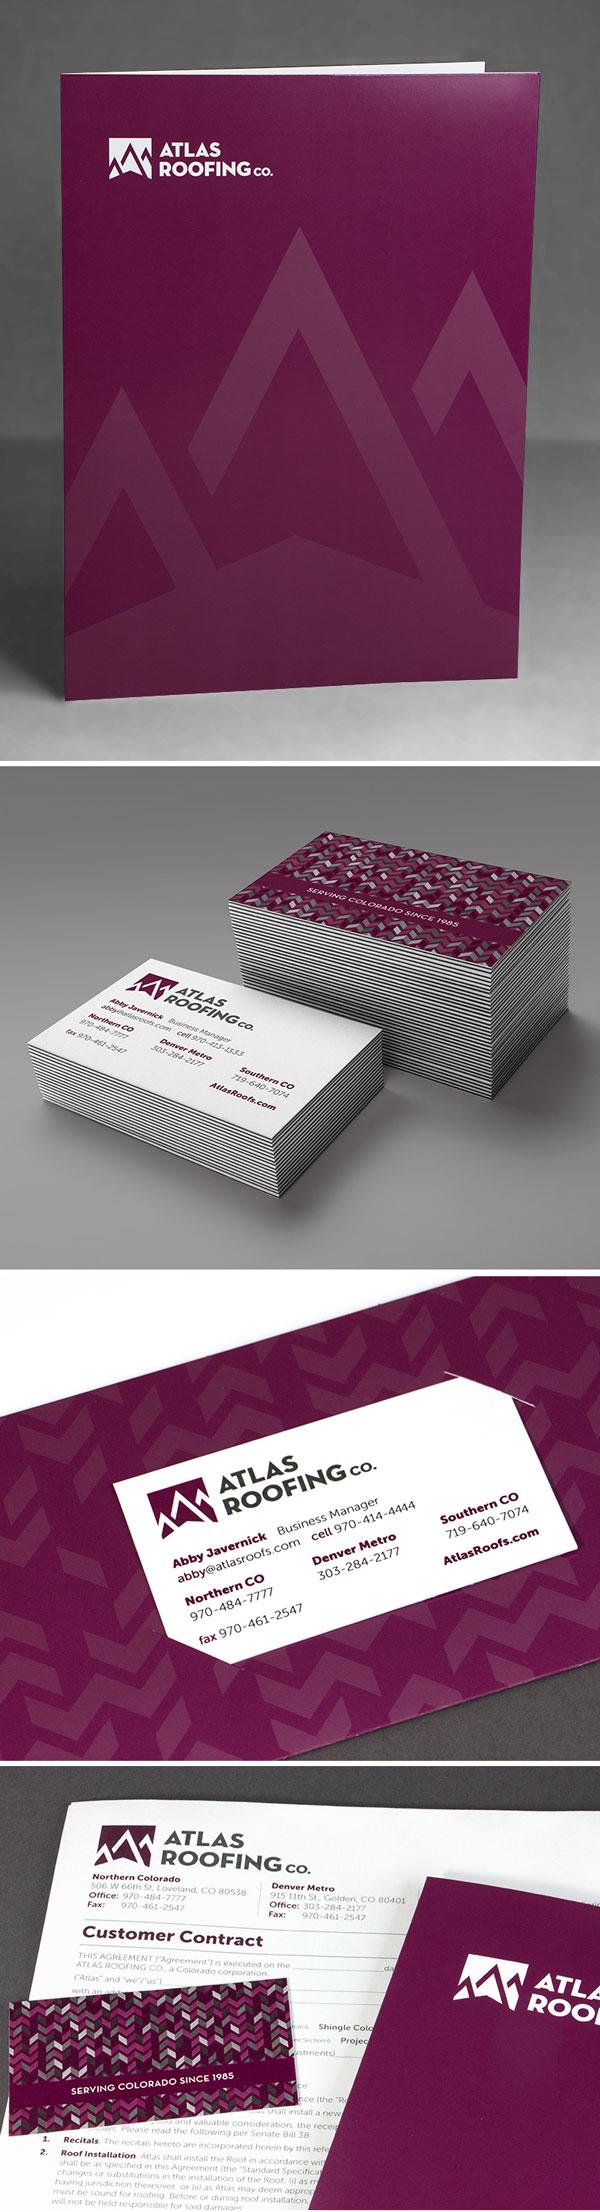 Atlas Roofing Pocket Folder Design U0026 Printing